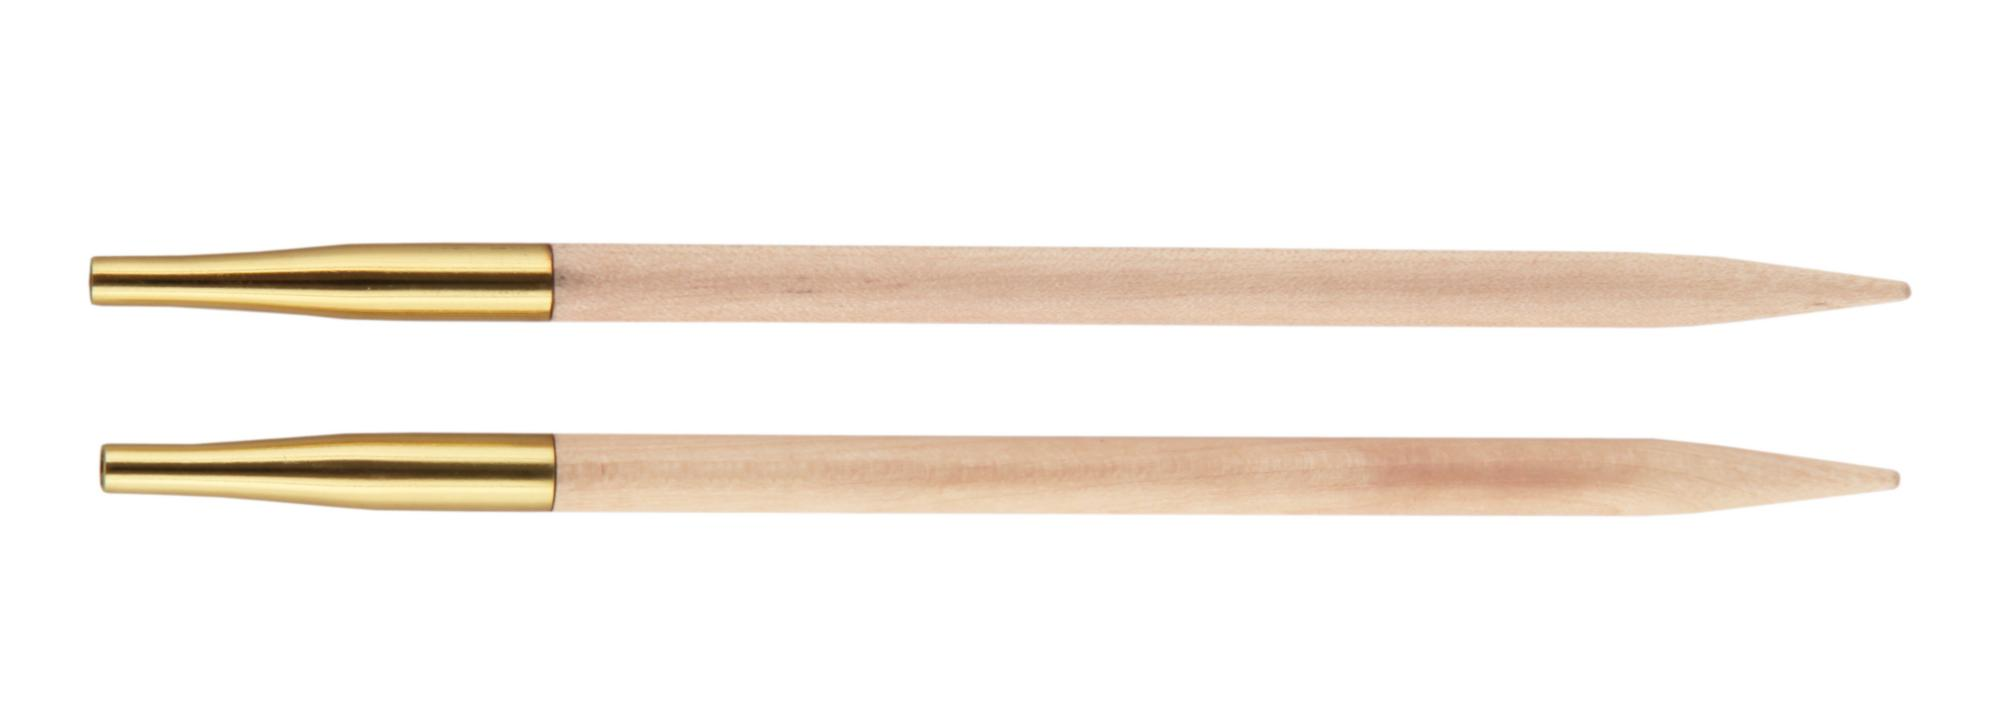 Спицы съемные Basix Birch Wood KnitPro, 35635, 4.00 мм